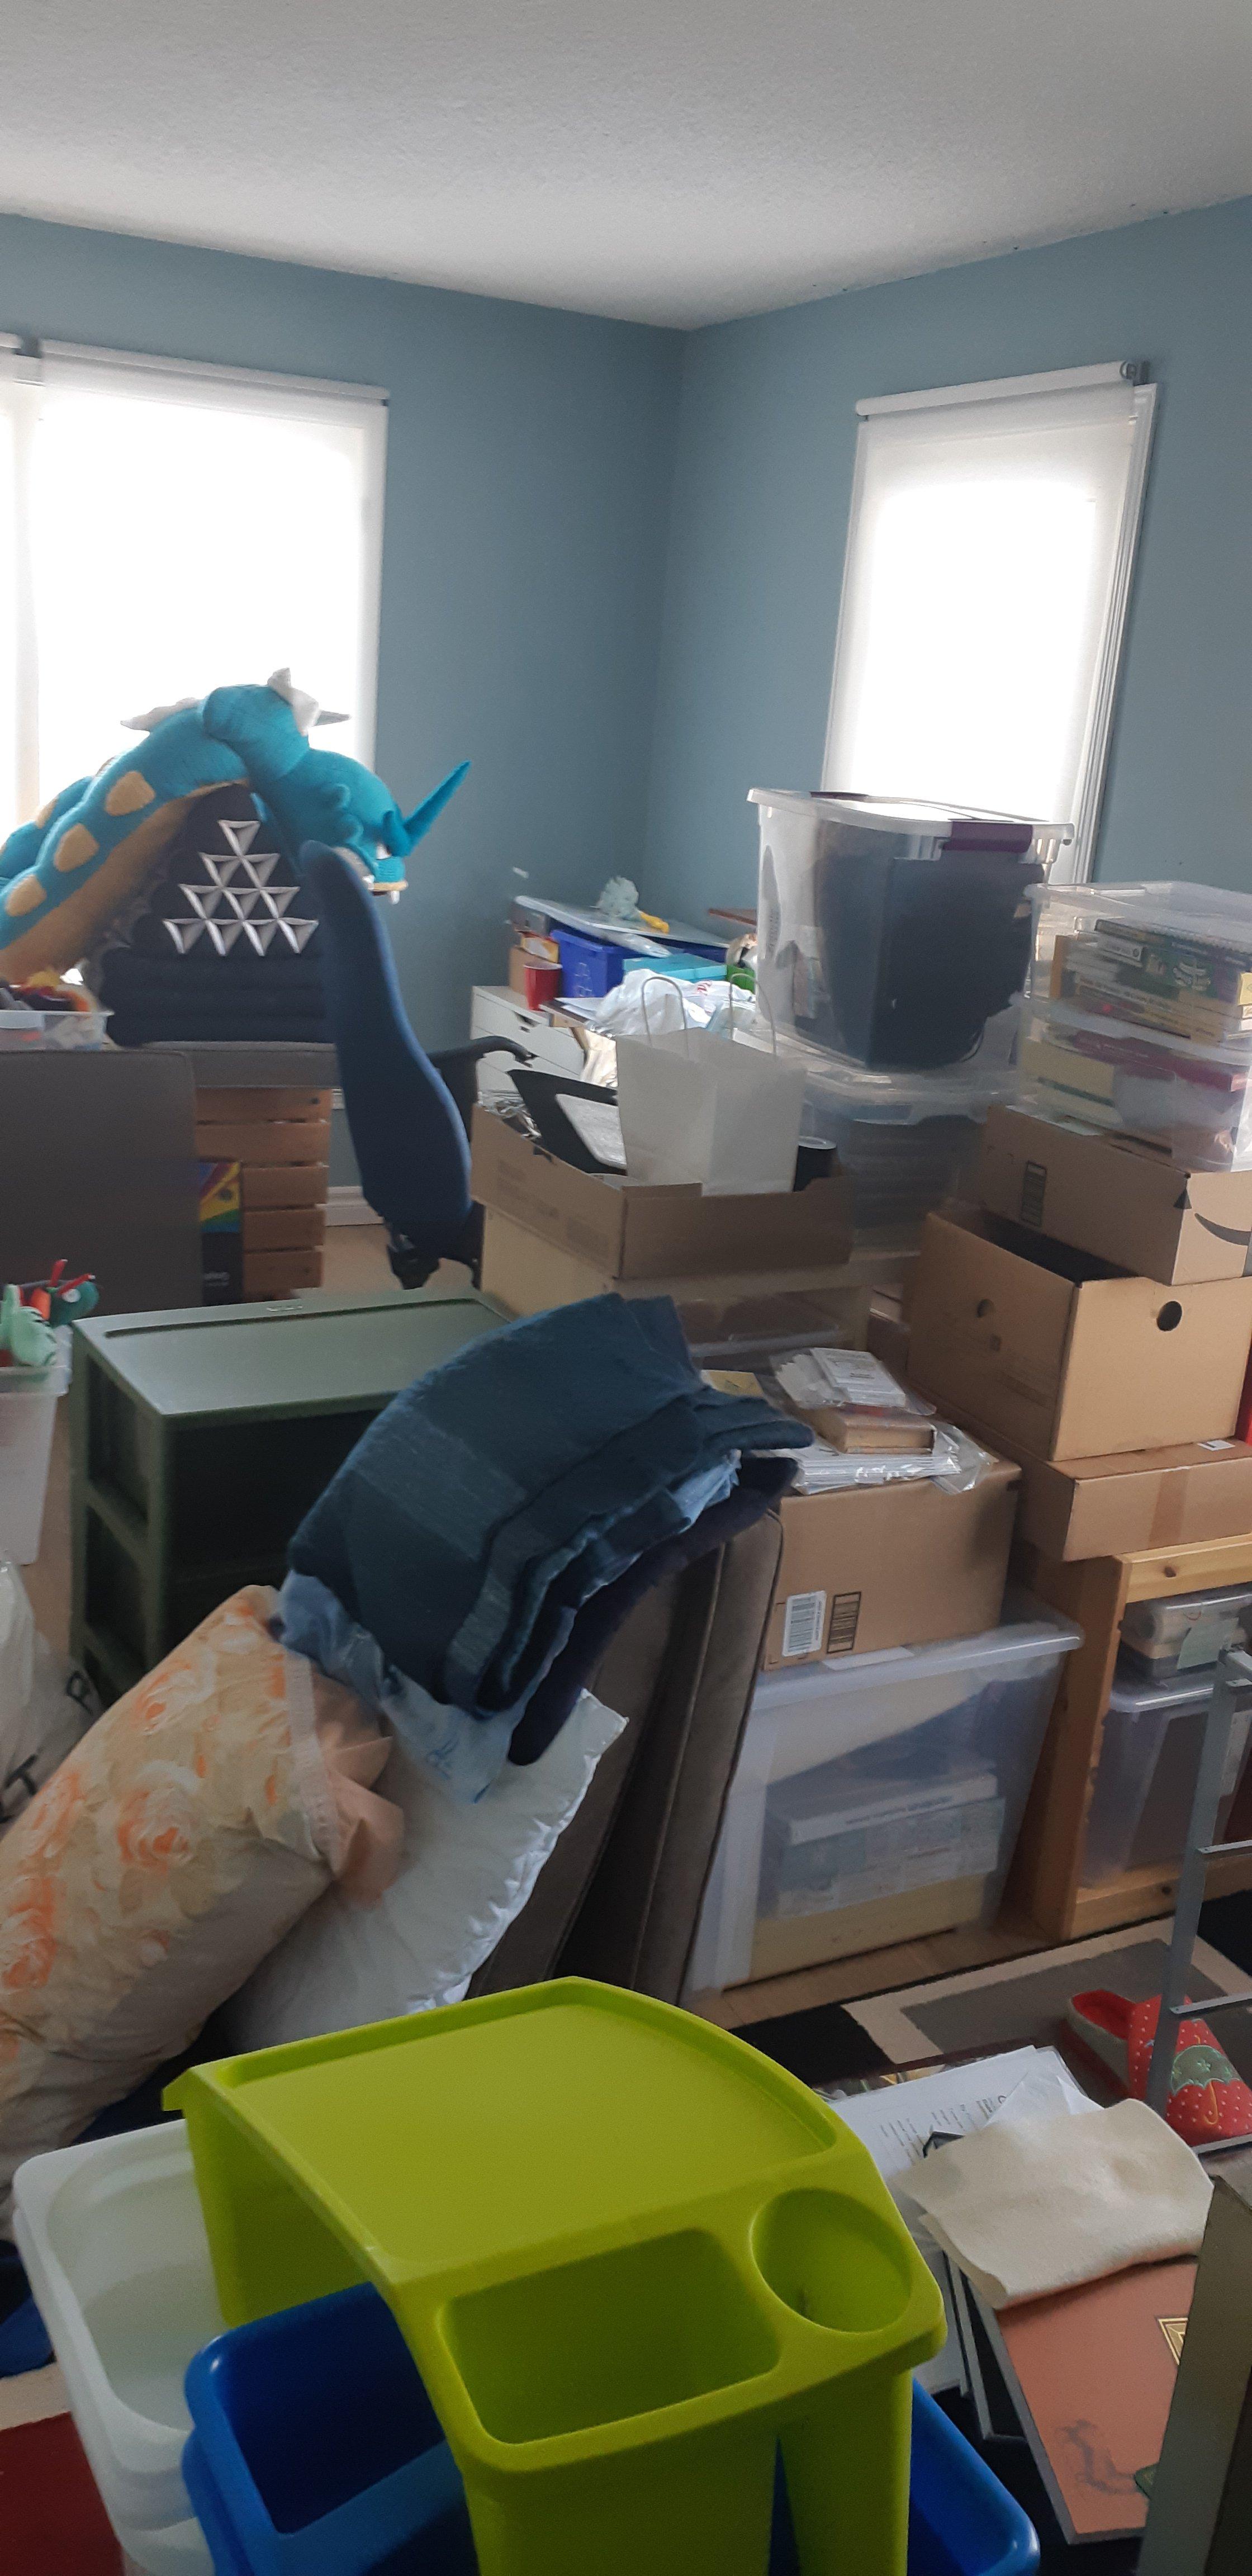 My unorganized craft room.